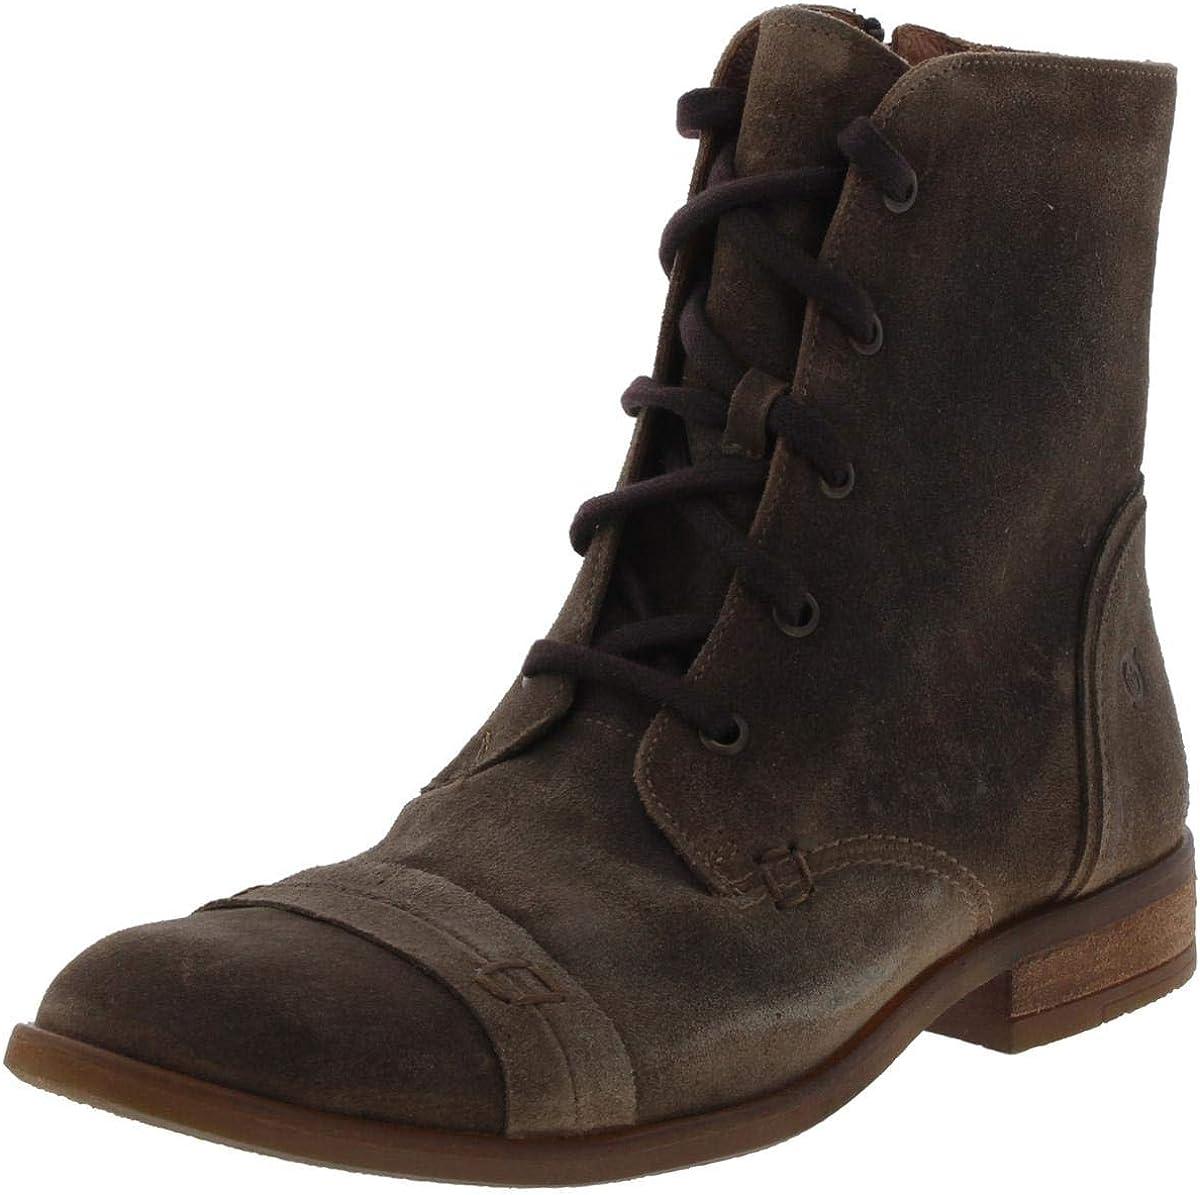 BORN Women's Dunay Suede Combat Boots